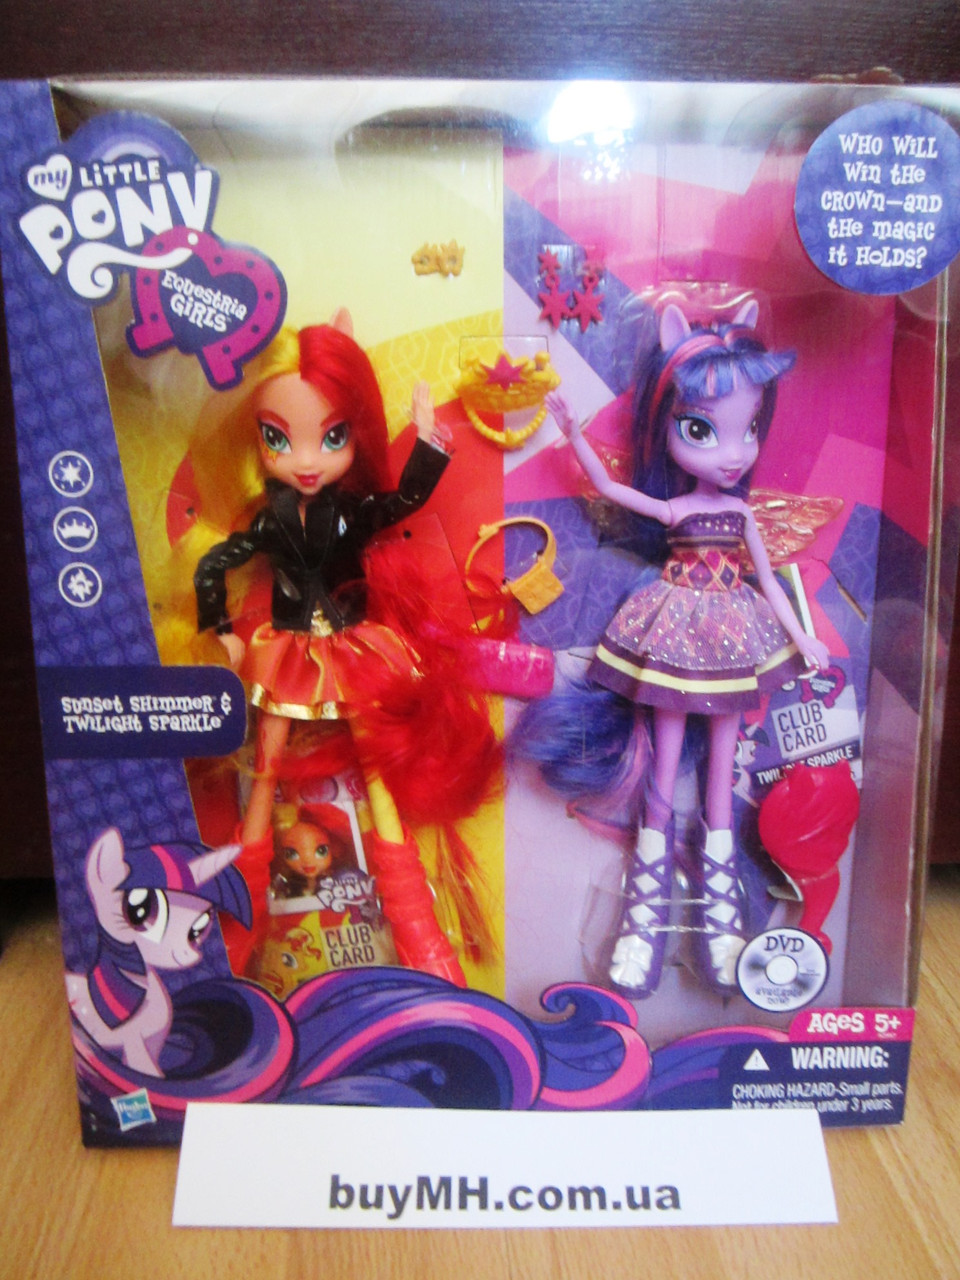 Набор кукол Сансет Шиммер и Твайлайт Спаркл My Little Pony Equestria Girls Sunset Shimmer and Twilight Sparkle, фото 1